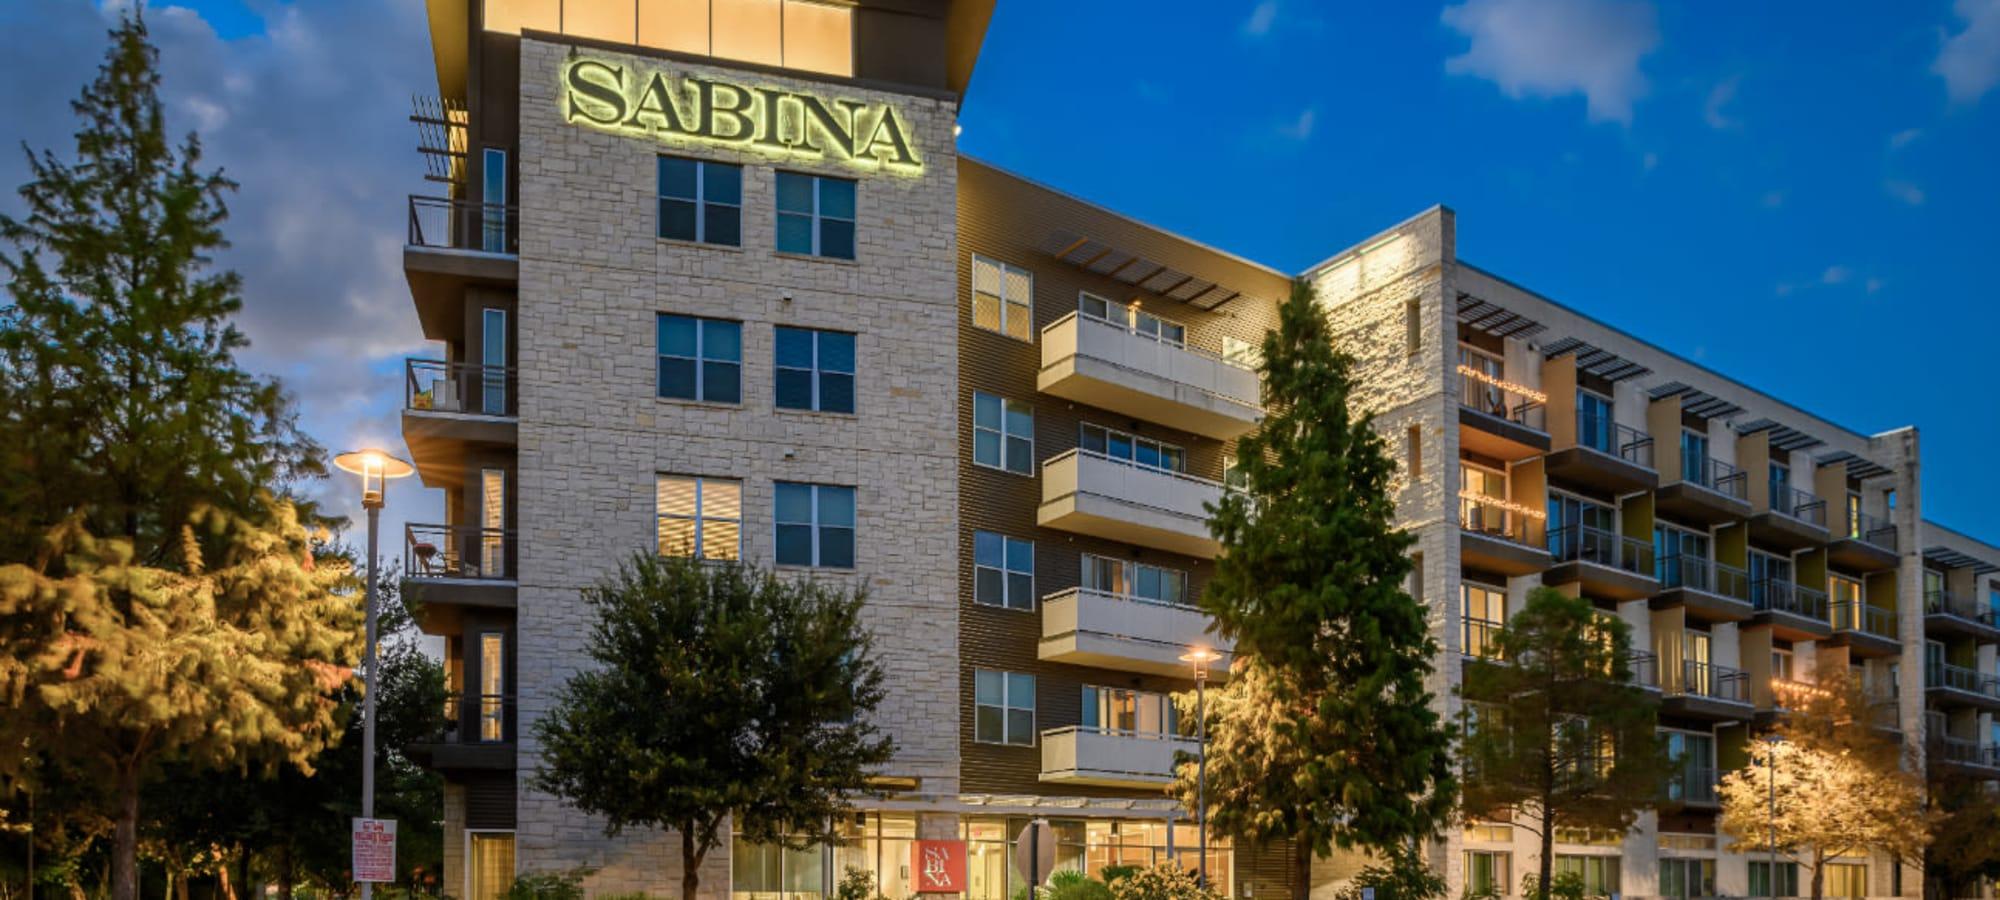 Exterior of Sabina in Austin, Texas